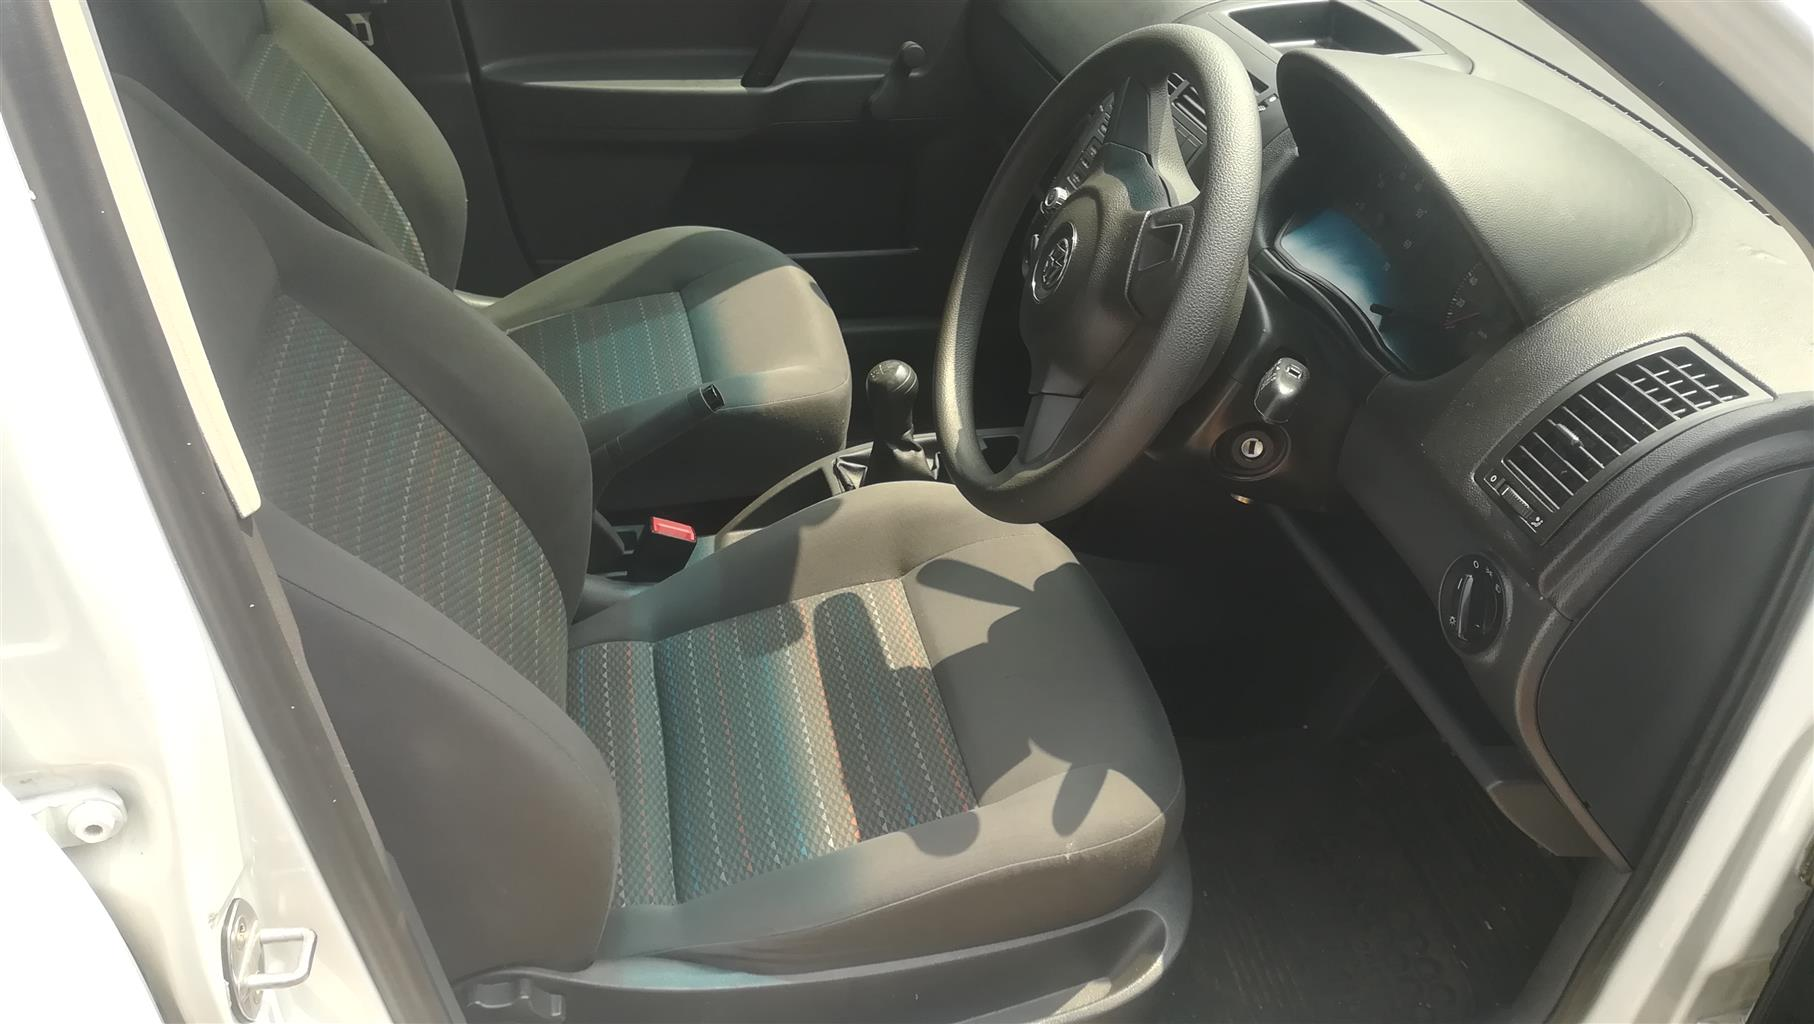 2017 VW Polo Vivo hatch 5-door POLO VIVO 1.4 TRENDLINE (5DR)